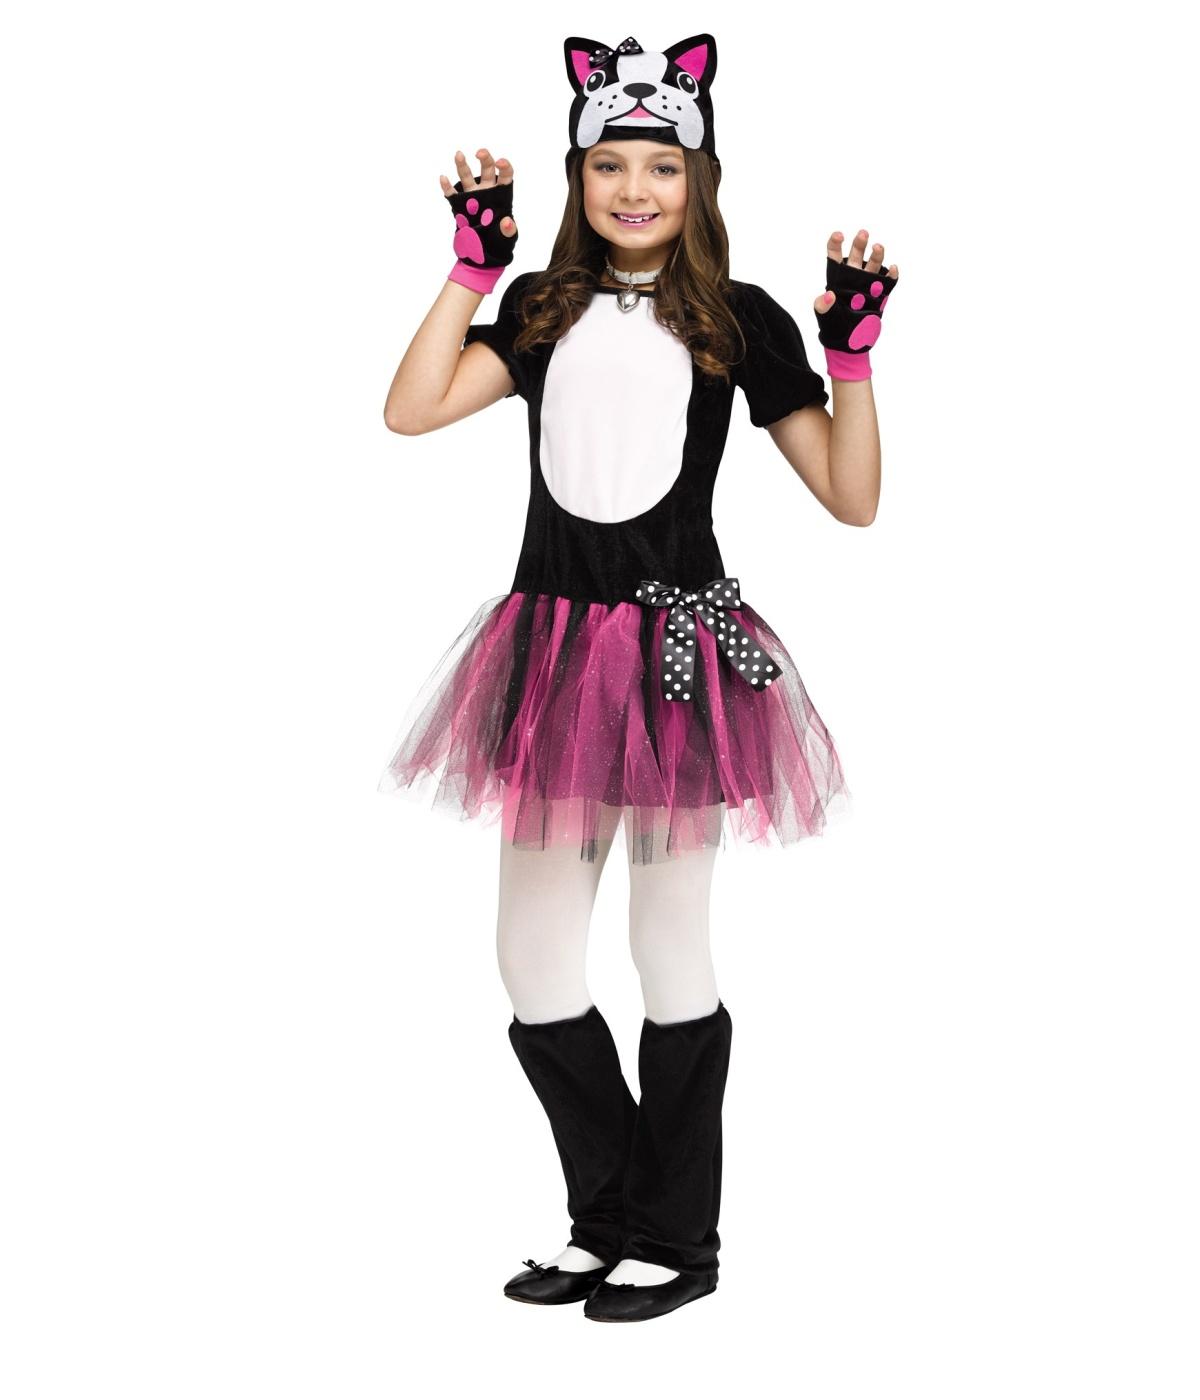 Bulldog Ballerina Girls Costume